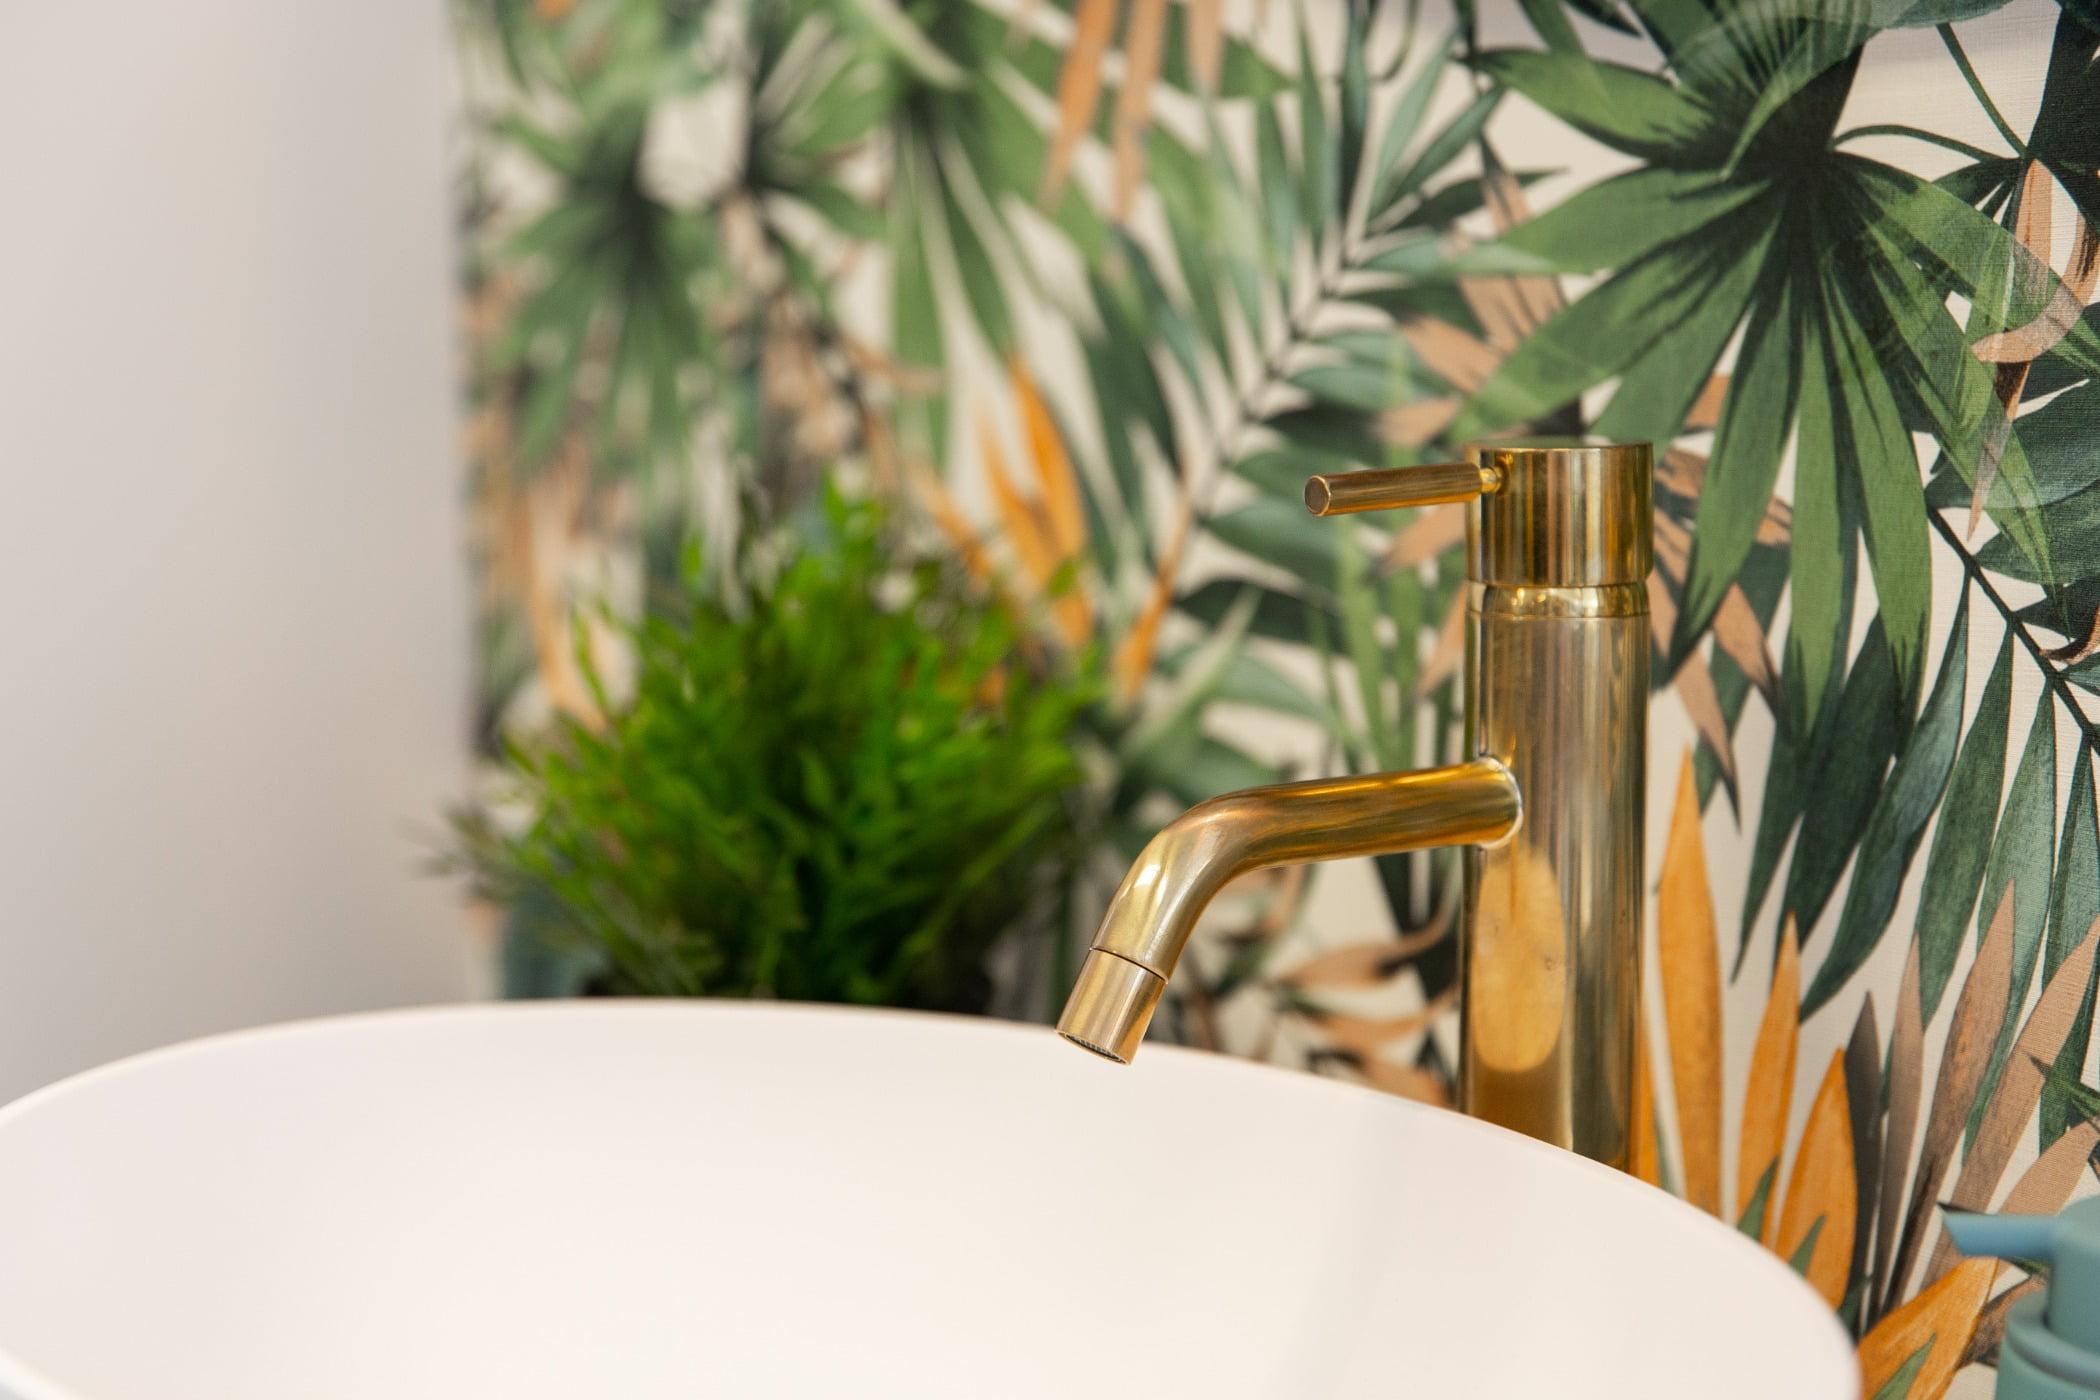 Interior design, Plant, Leaf, Dishware, Botany, Tableware, Wood, Tablecloth, Twig, Grass